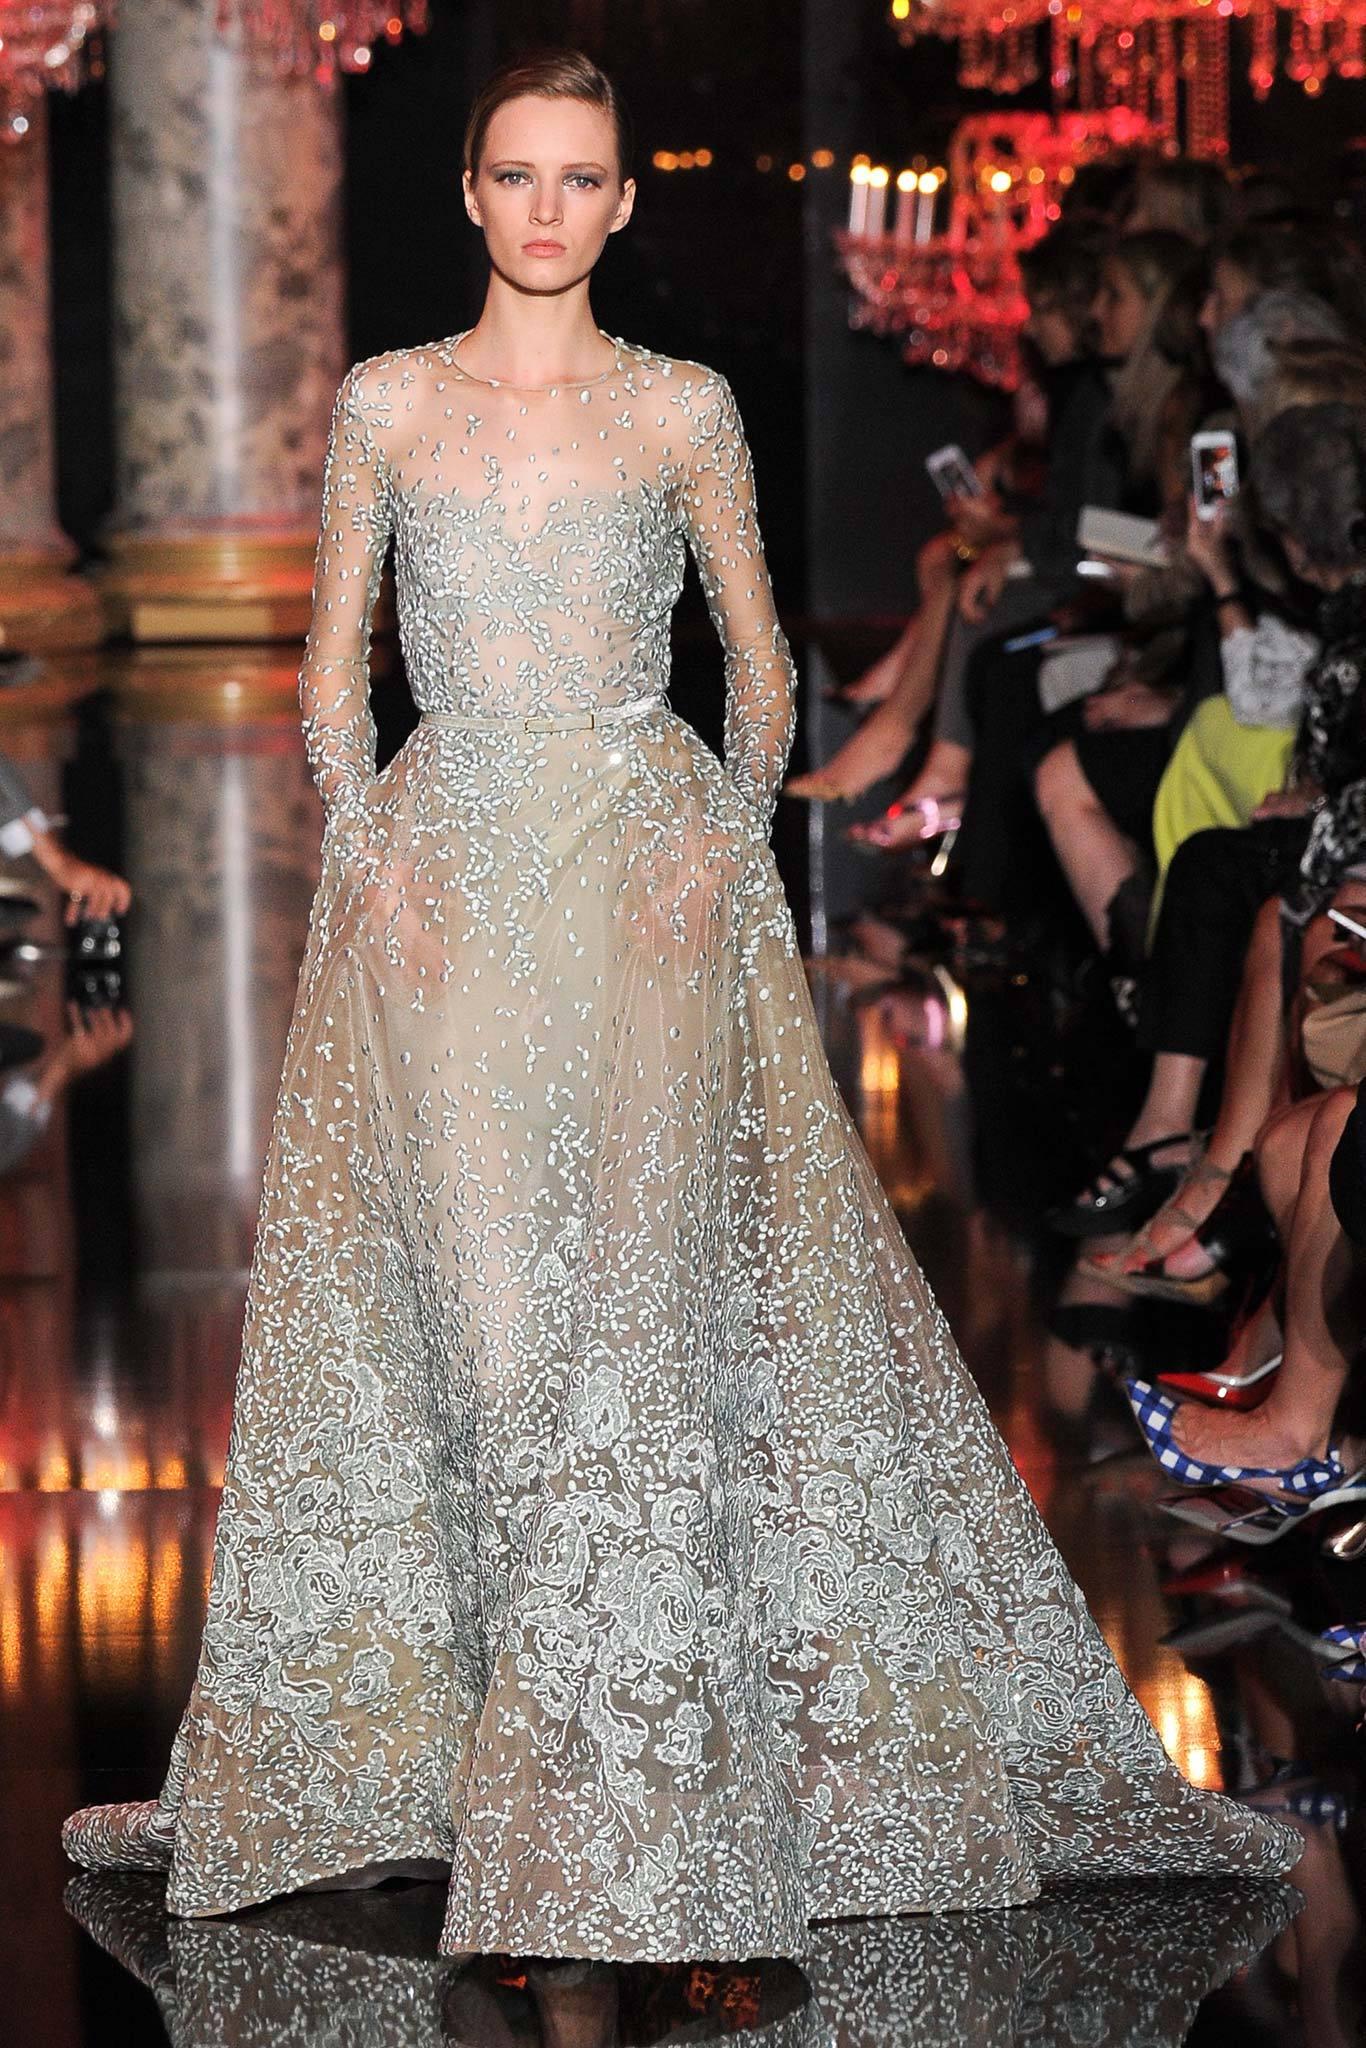 Elie-Saab-Couture-Fall2014-20.JPG